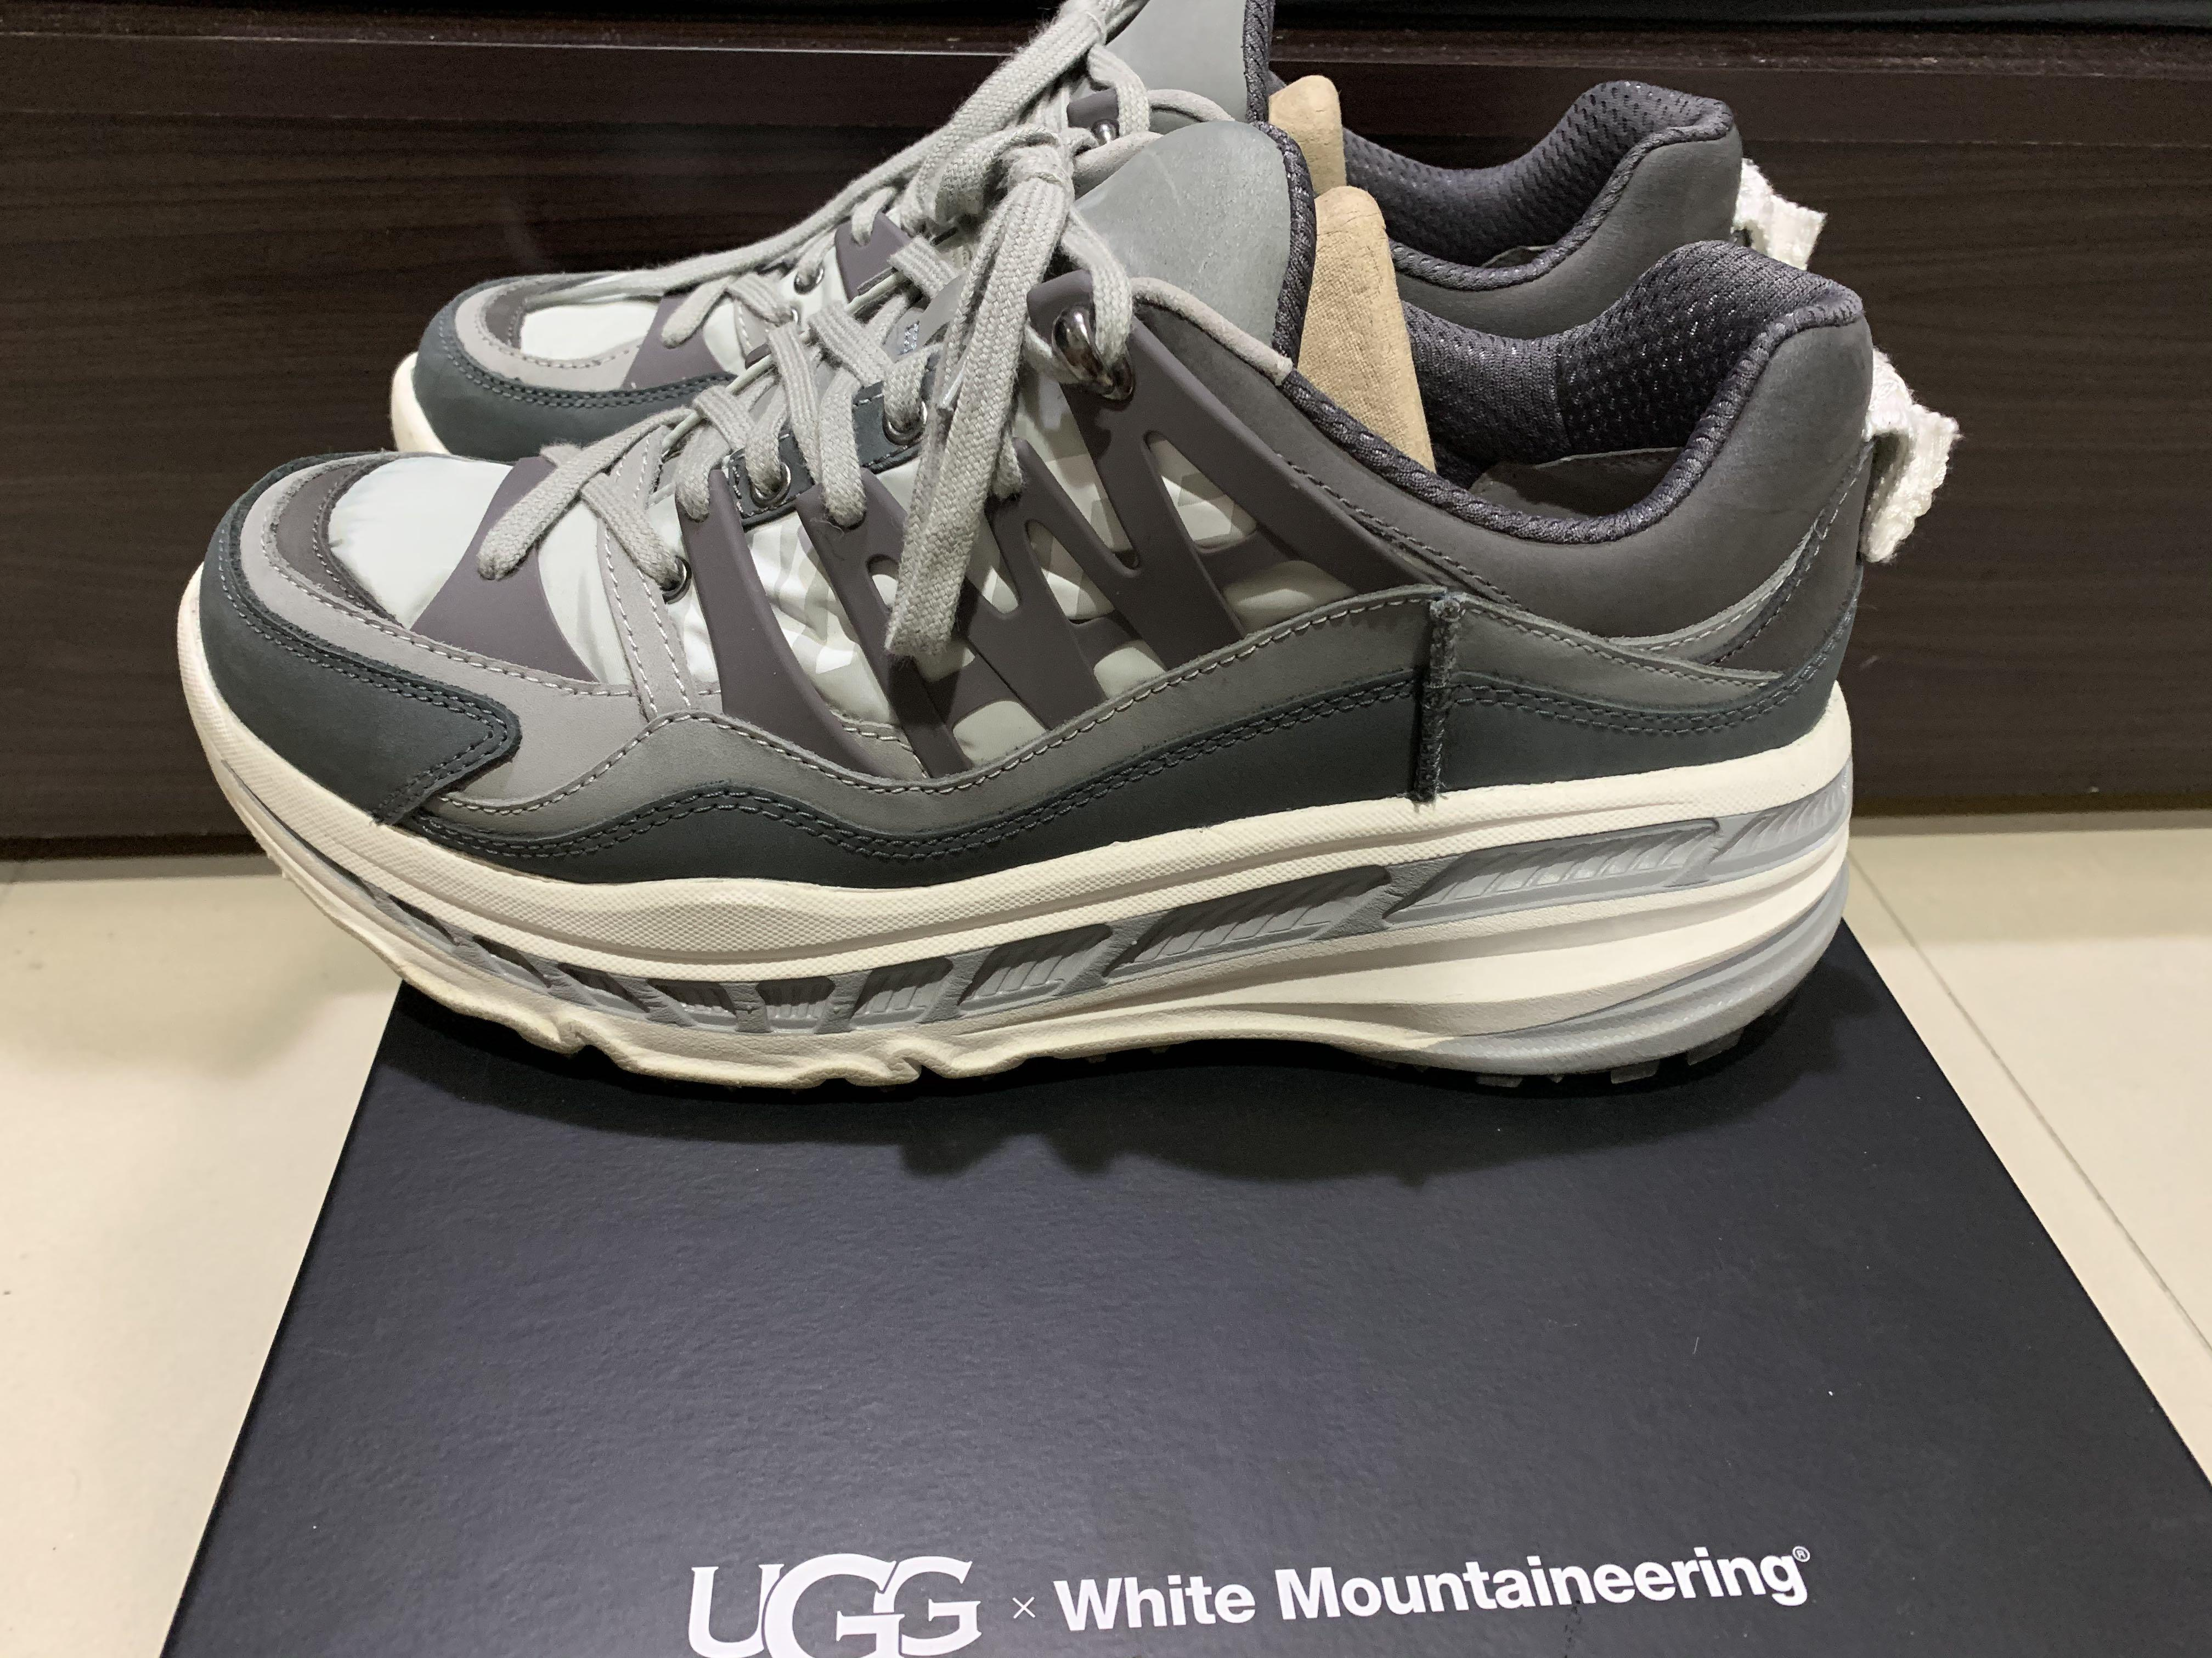 Ugg x white mountaineering  CA805